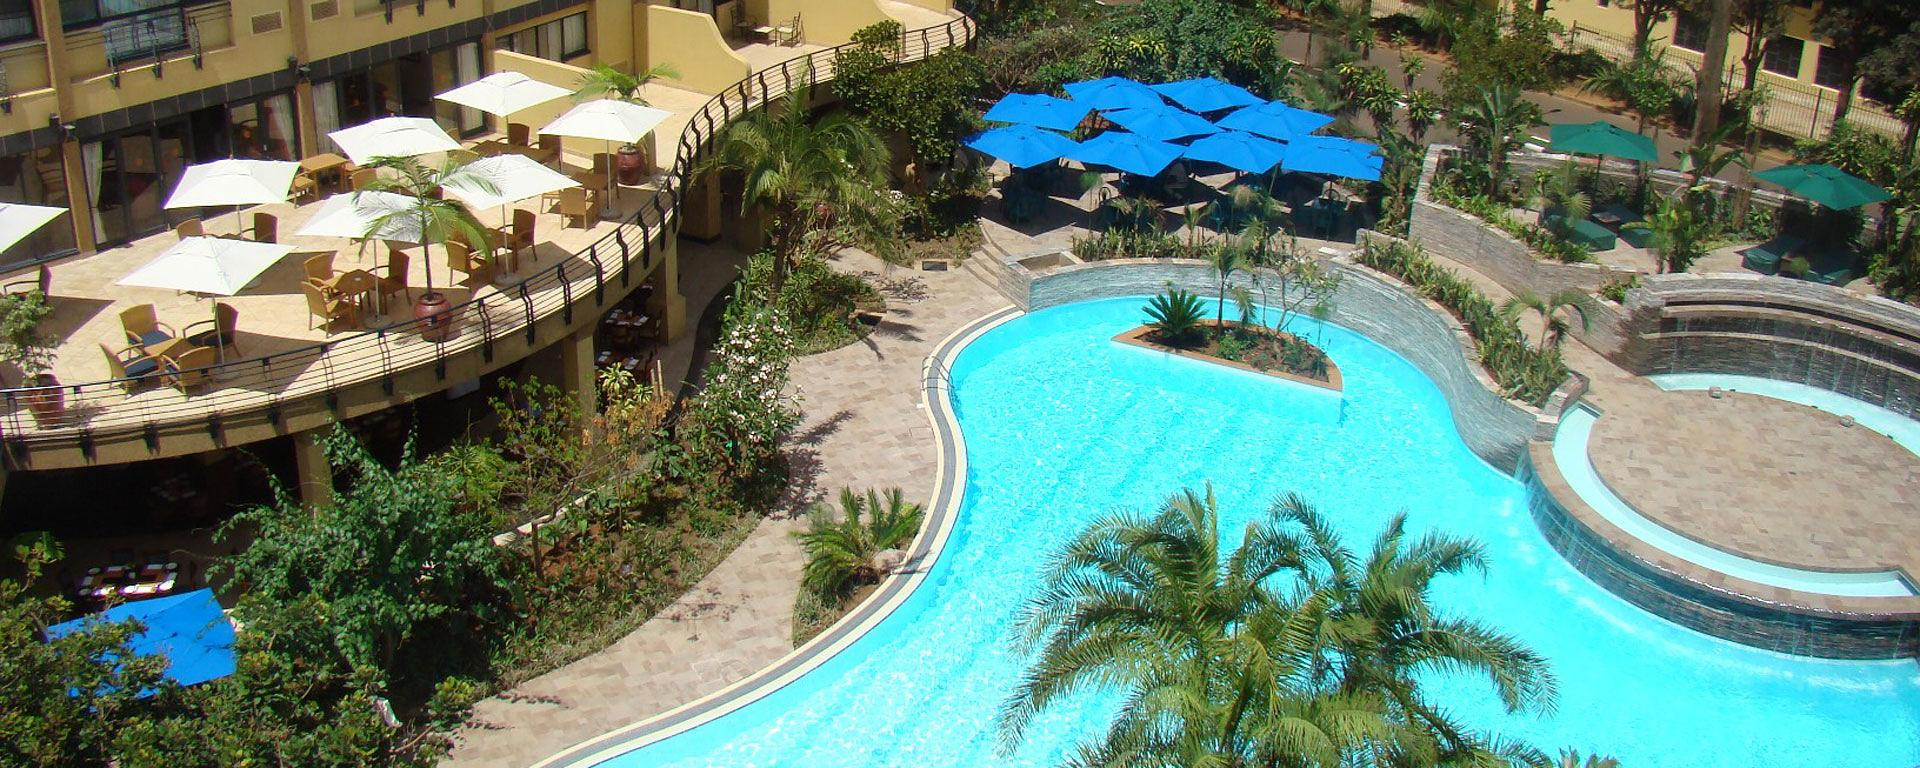 kigali-serena-hotel-rwanda